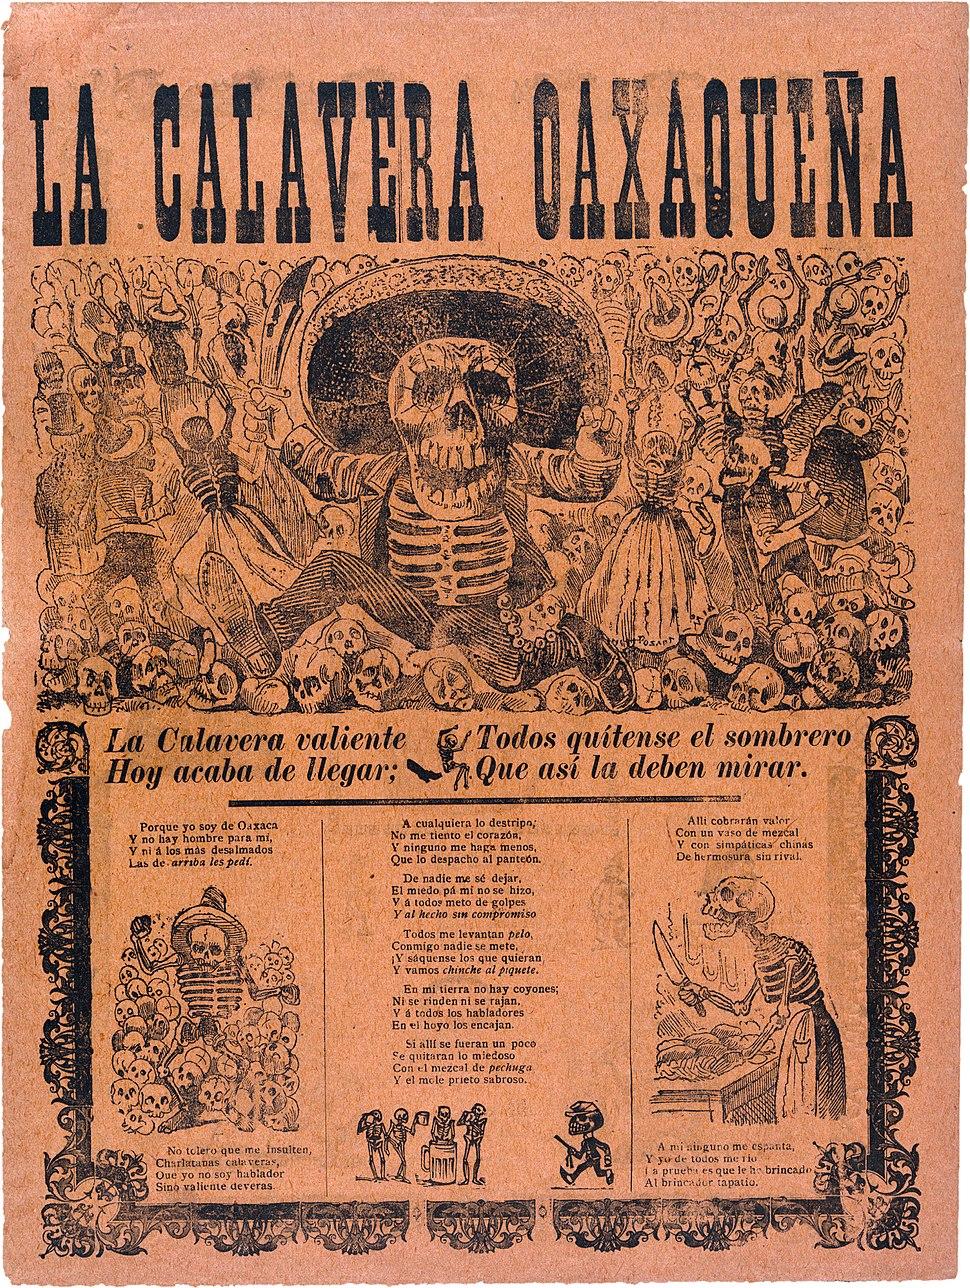 José Guadalupe Posada, Calavera oaxaqueña, broadsheet, 1903